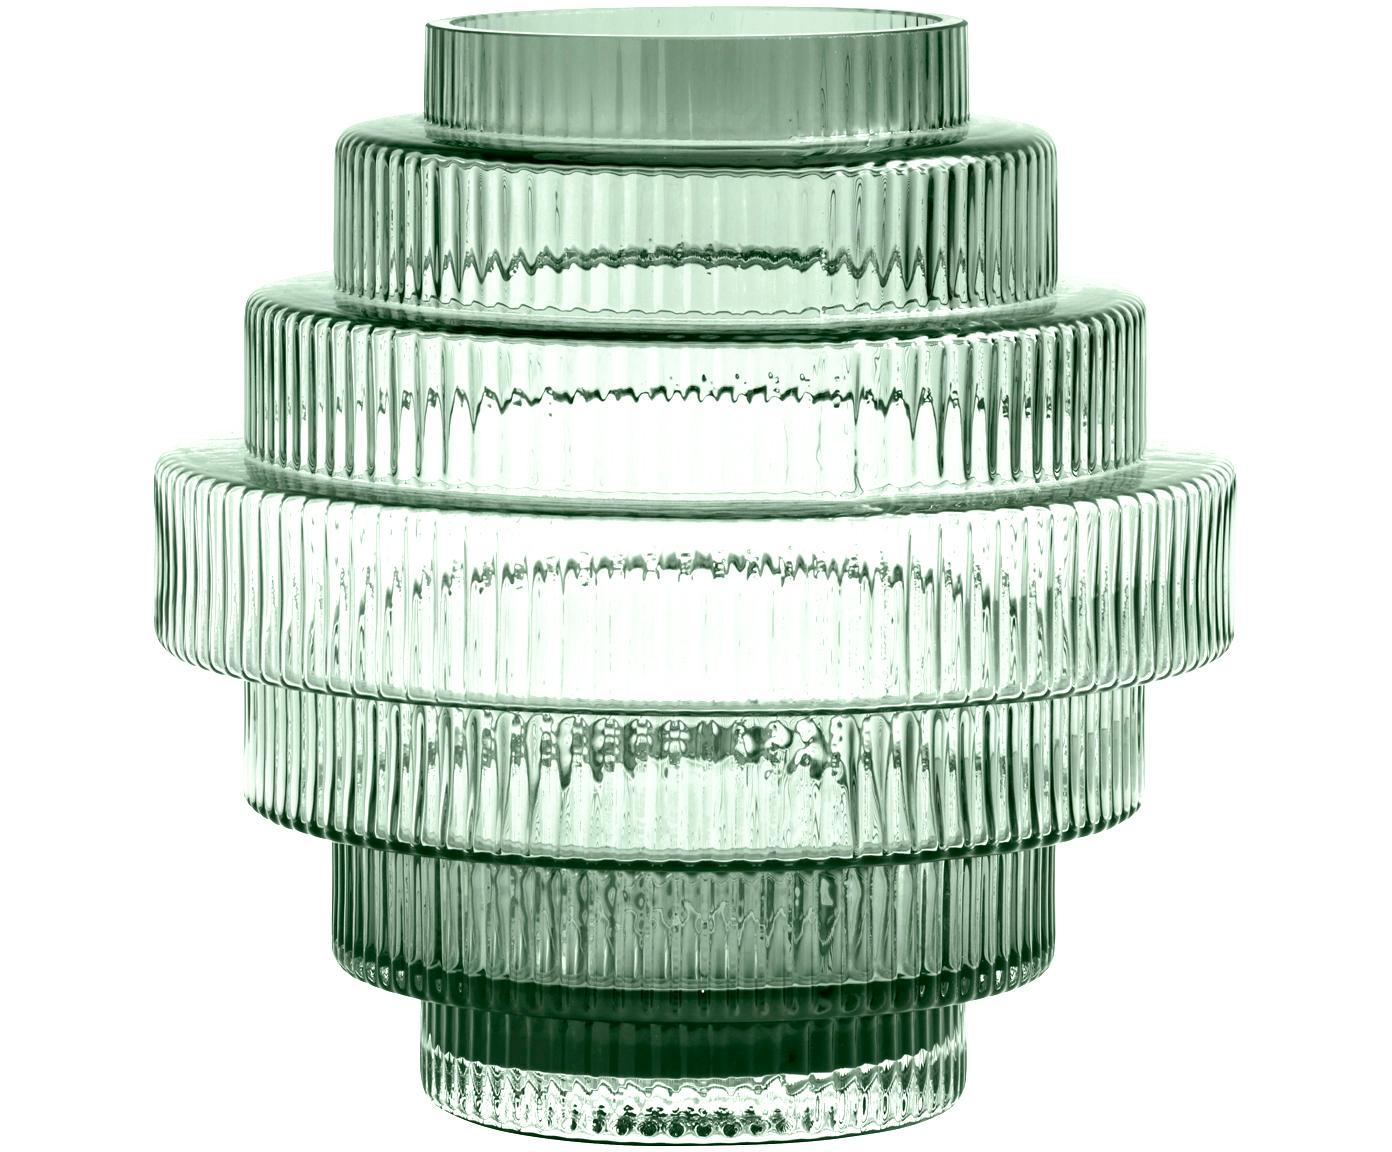 Glas-Vase Rilla, Glas, Grün, Ø 22 x H 24 cm